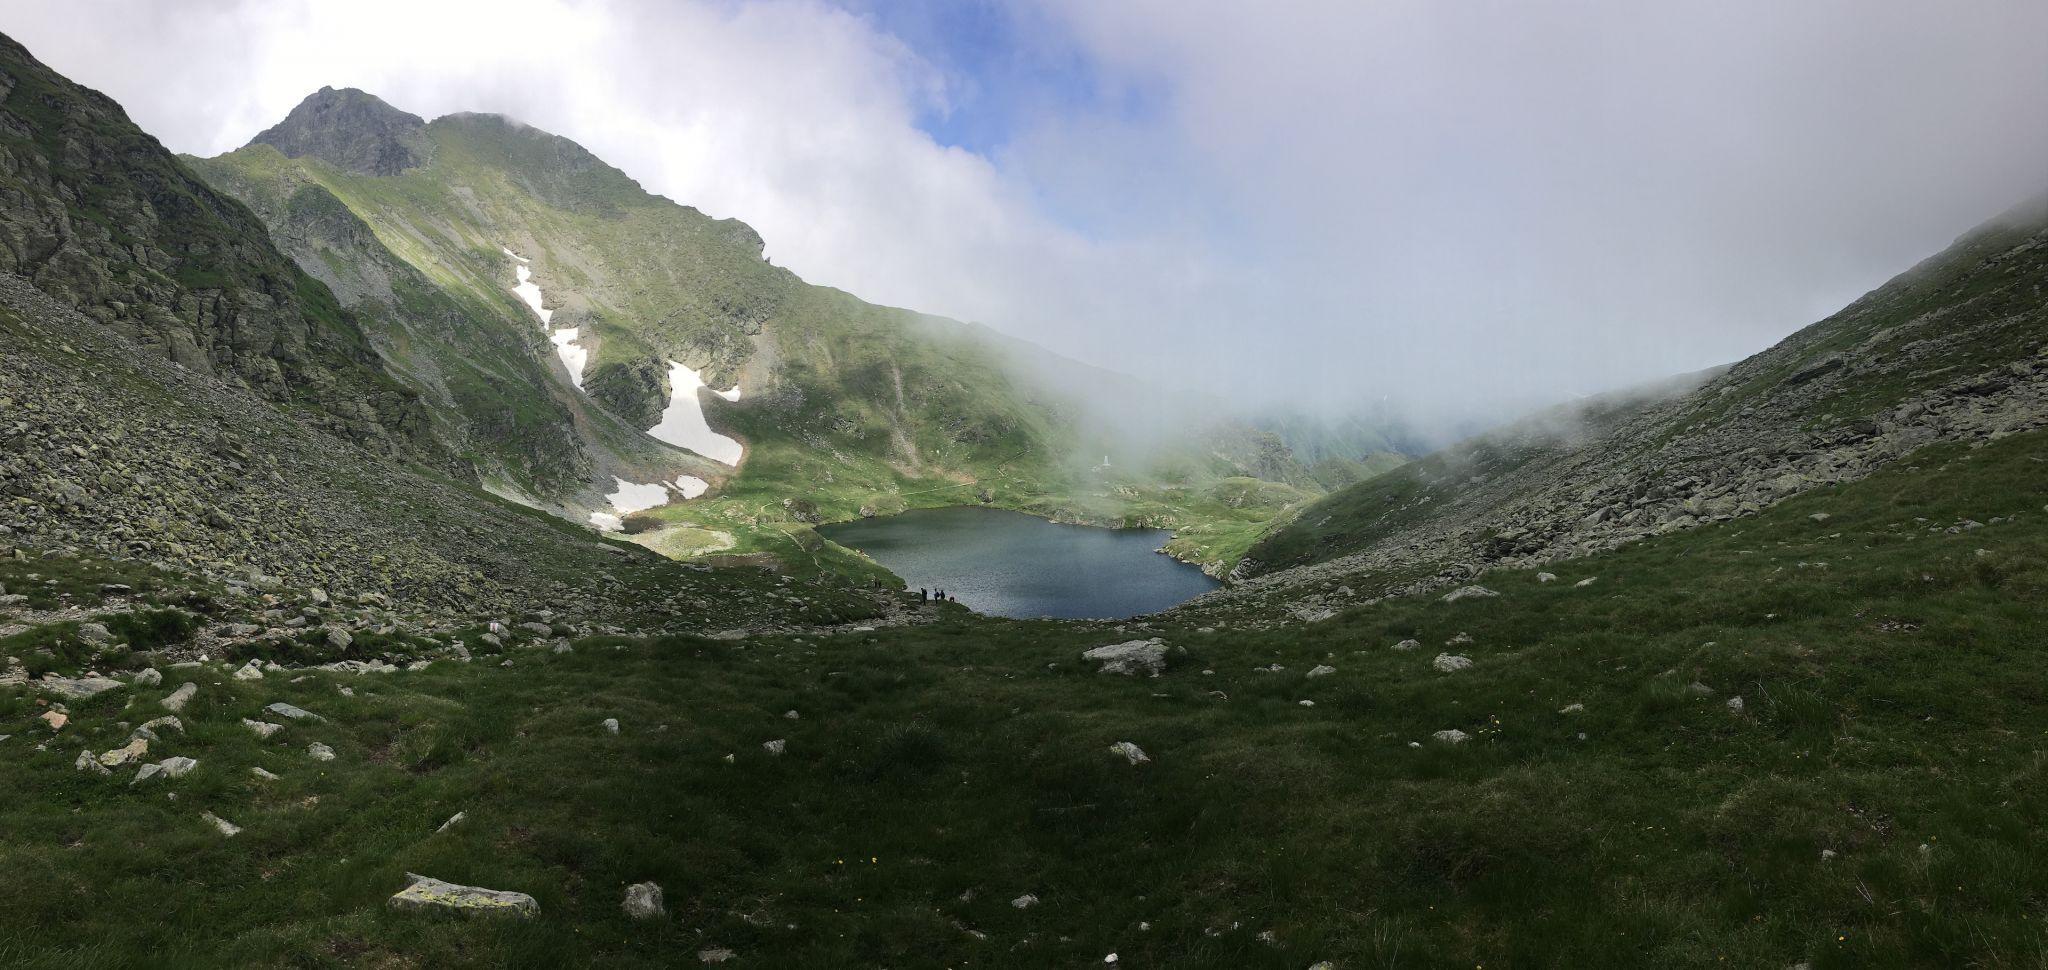 Capra Lake overview, Romania